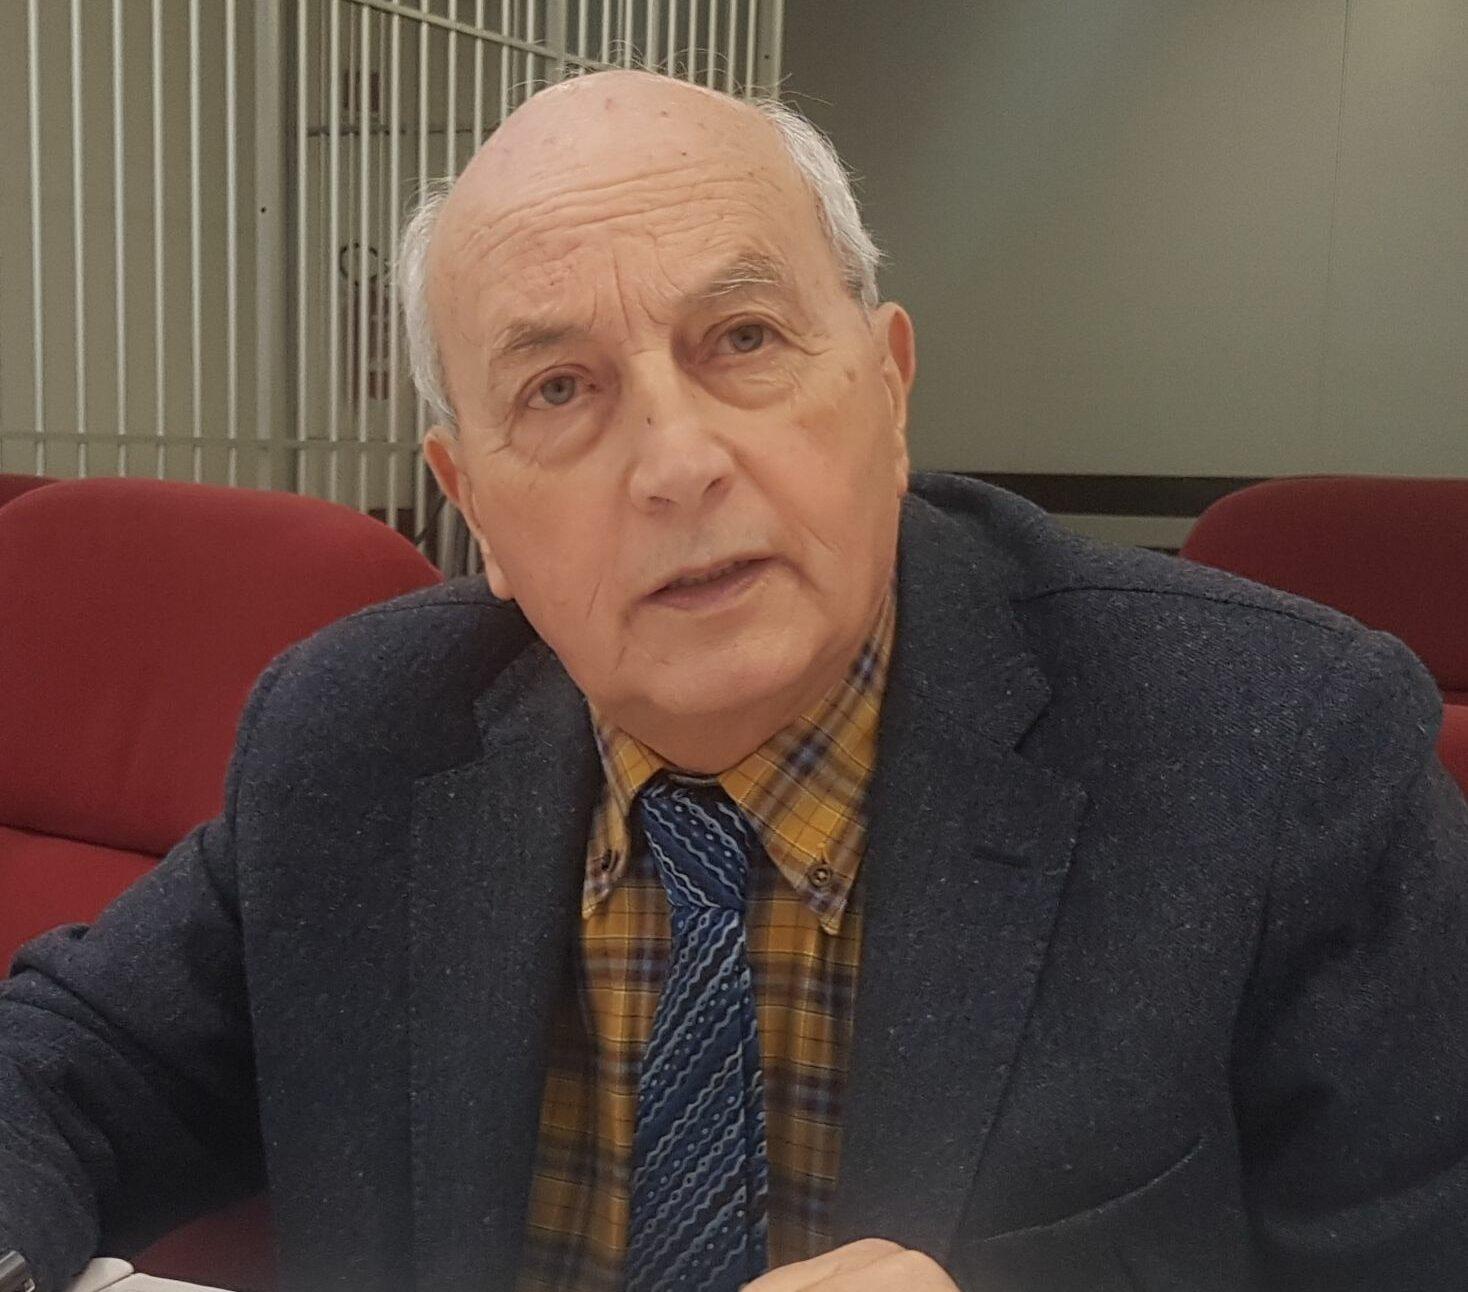 ubaldo-luchetti-e1620486022724